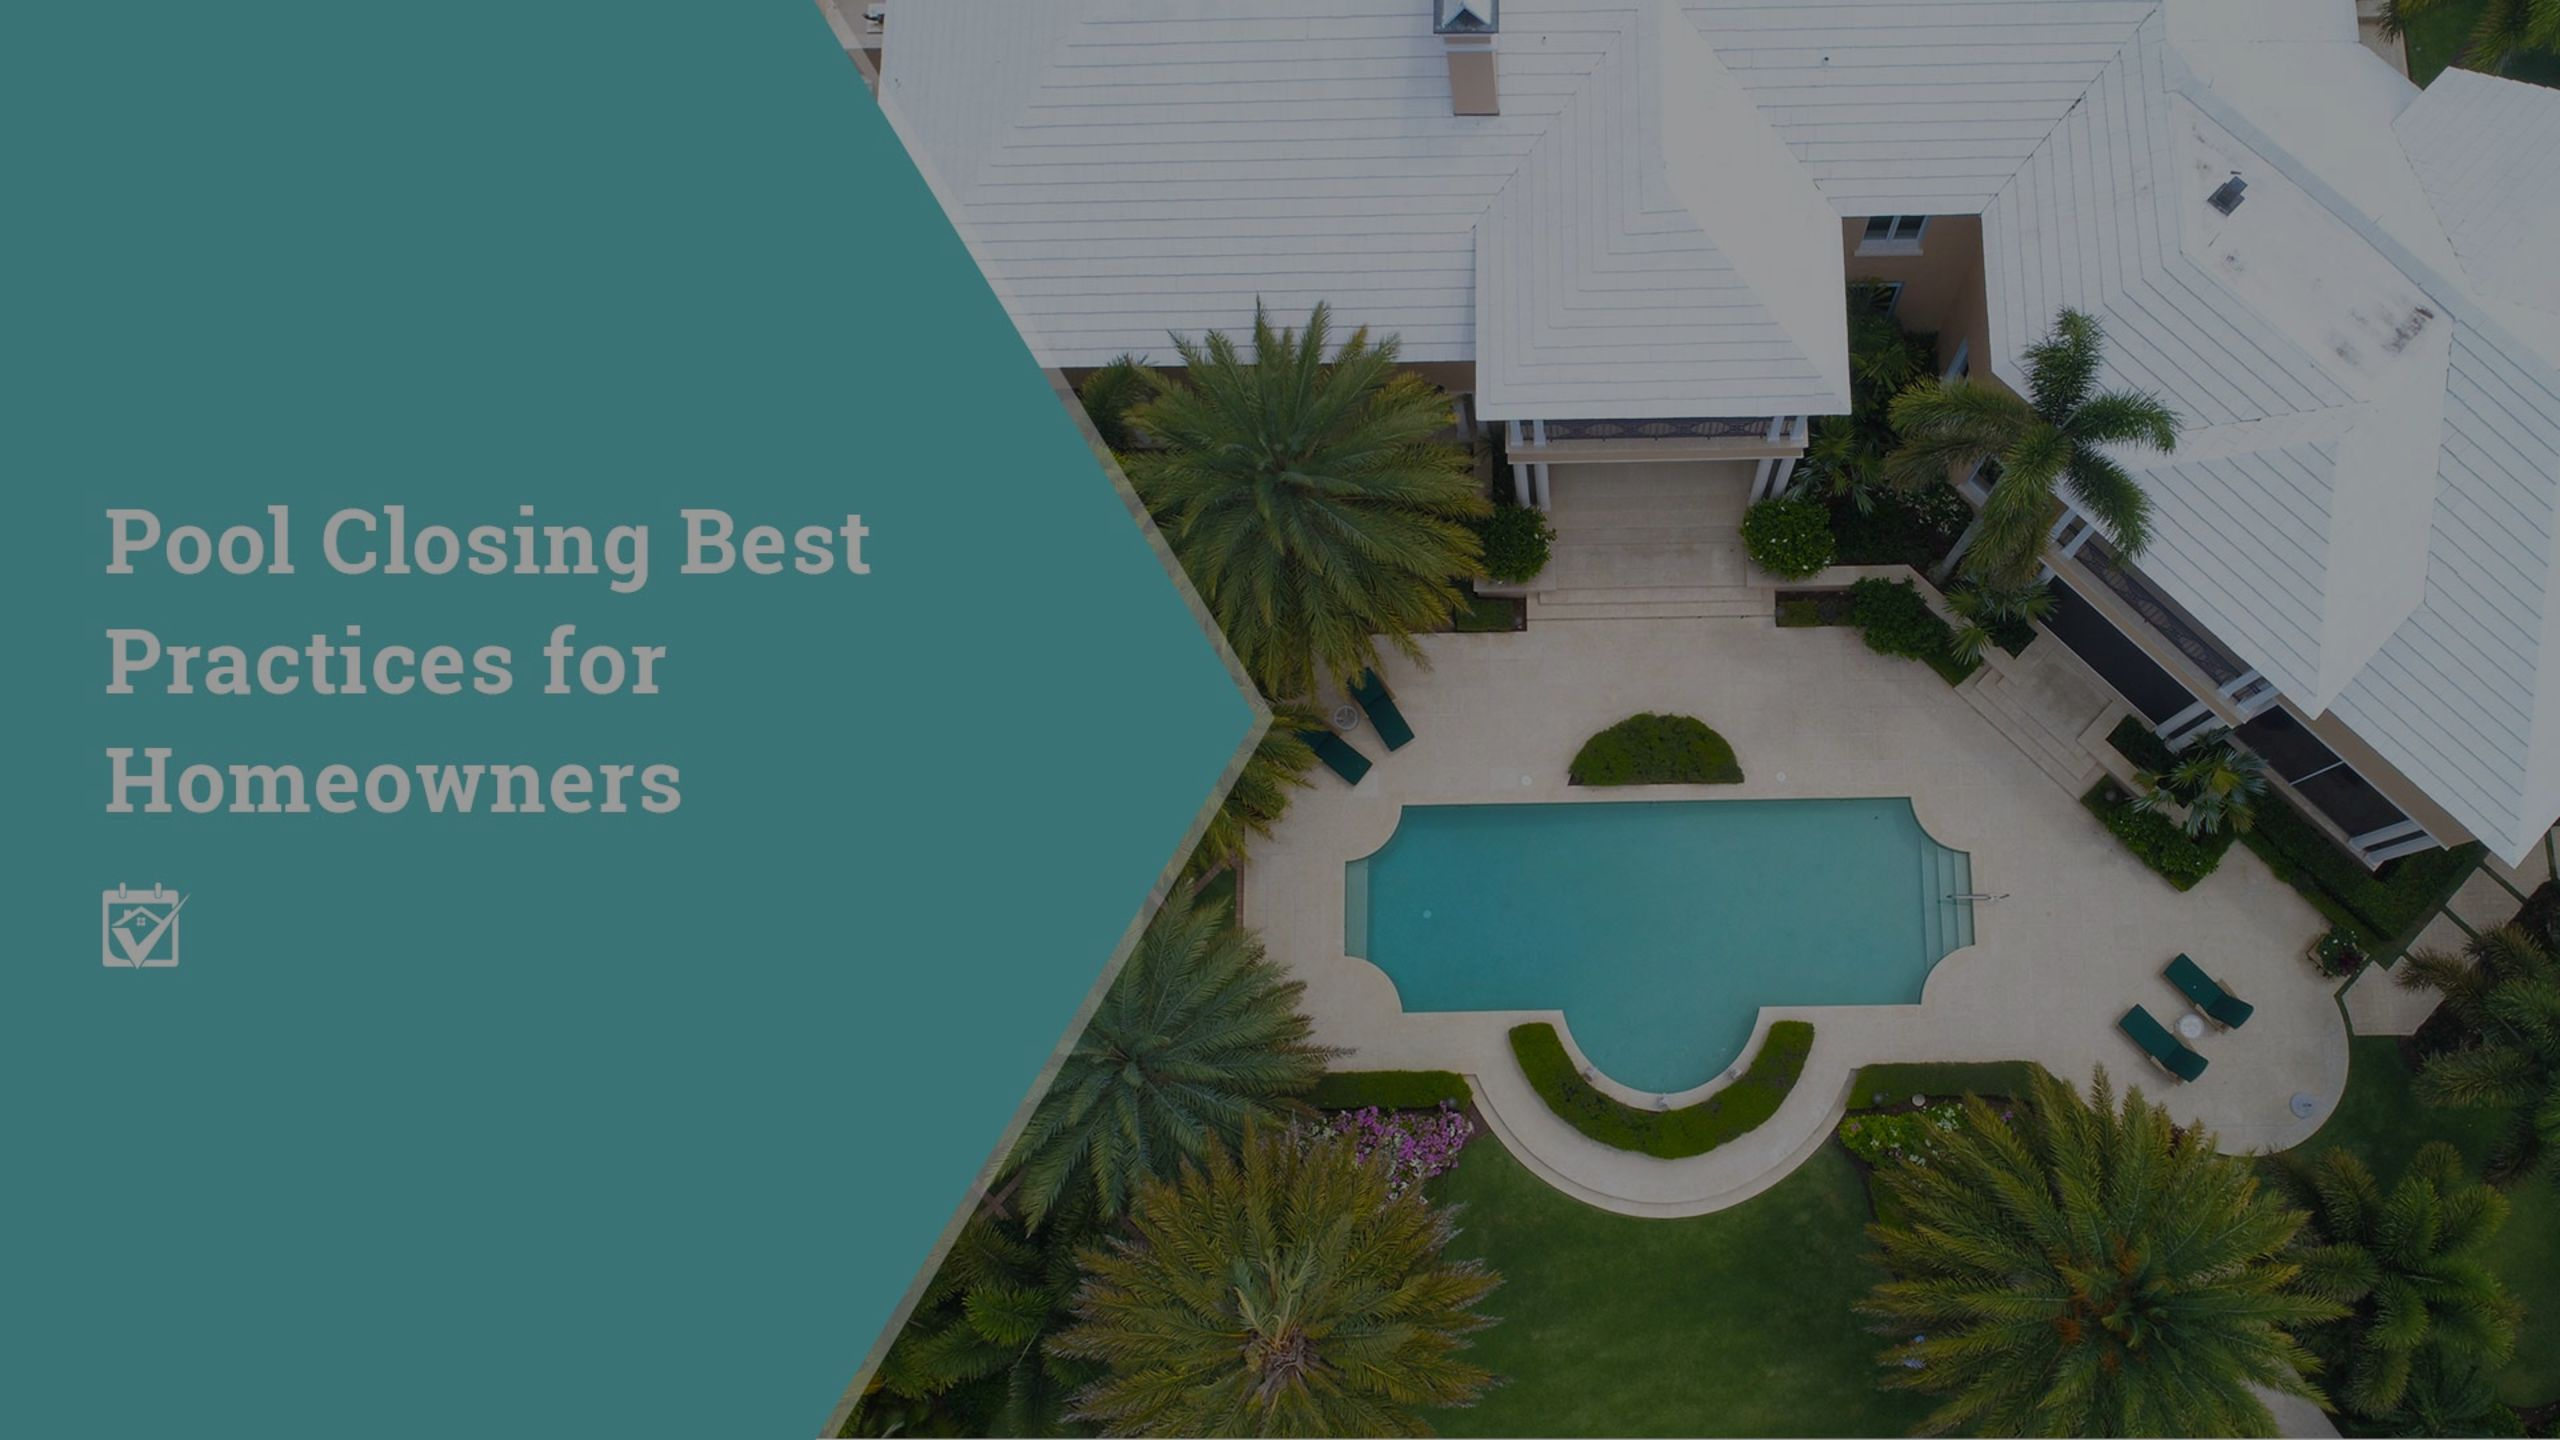 Pool Closing Best Practices